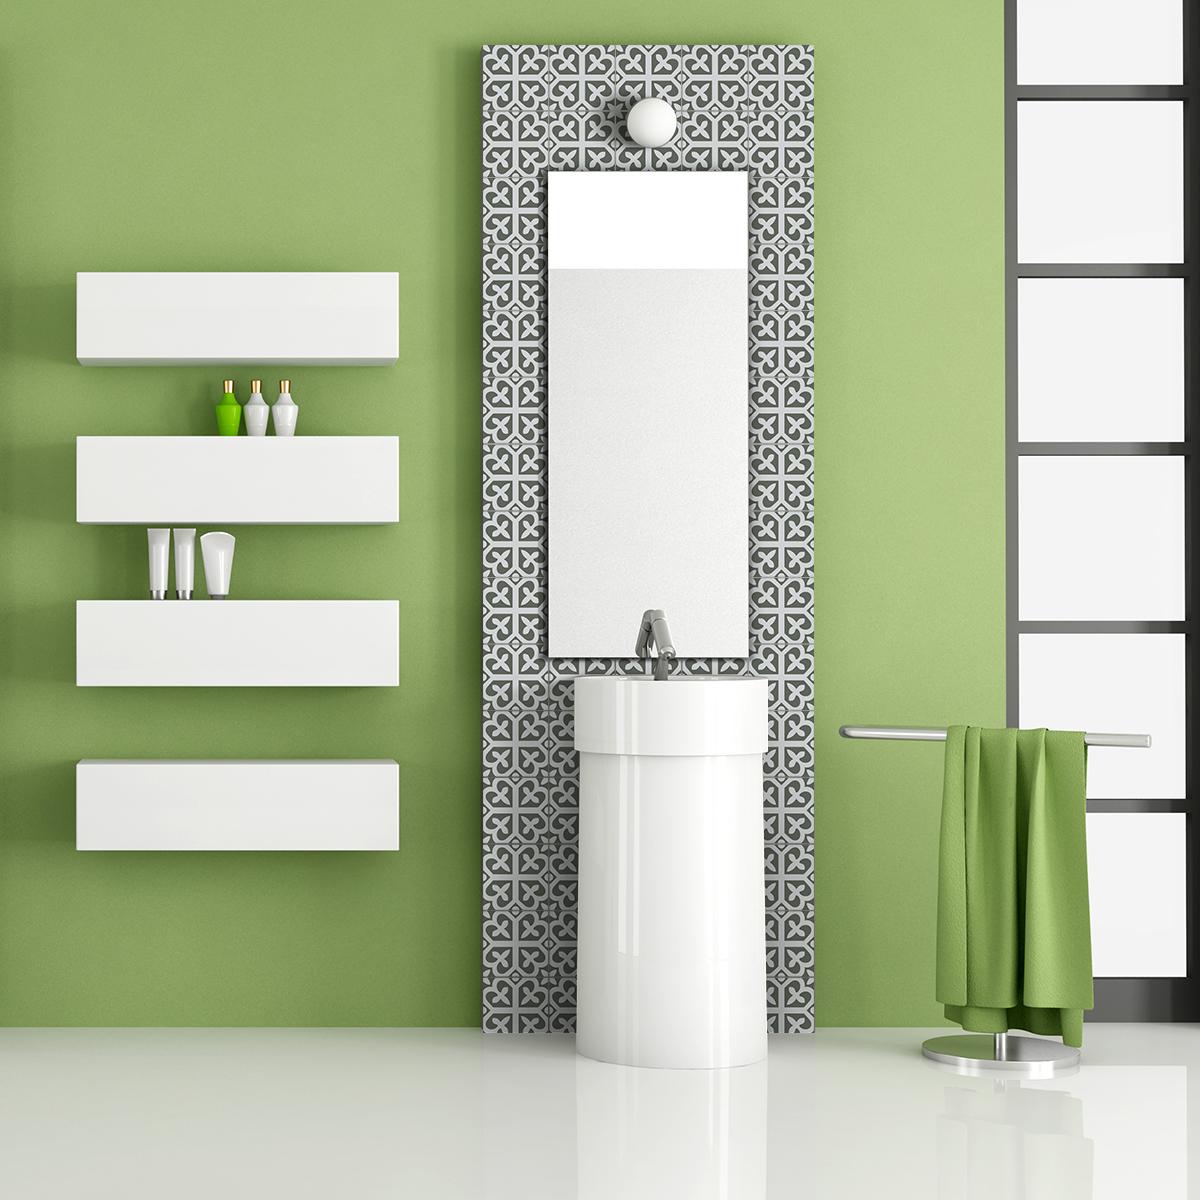 24 stickers carreaux de ciment azulejos cara cuisine. Black Bedroom Furniture Sets. Home Design Ideas